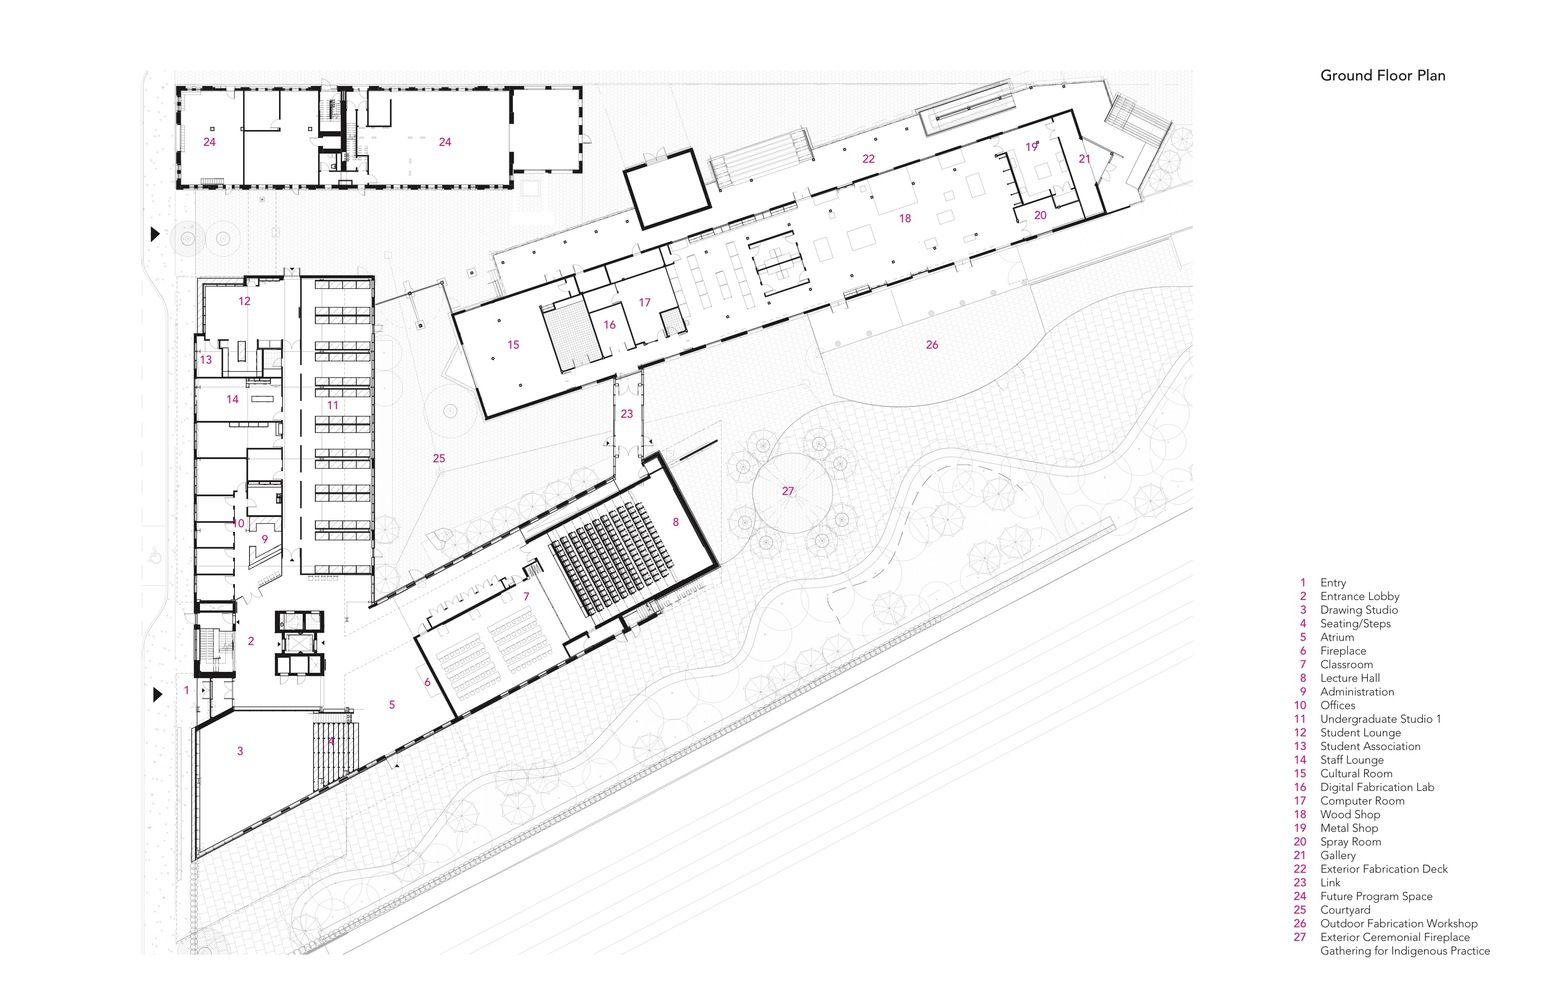 Gallery Of Mcewen School Of Architecture Lga Architectural Partners 25 School Architecture Ground Floor Plan Architecture